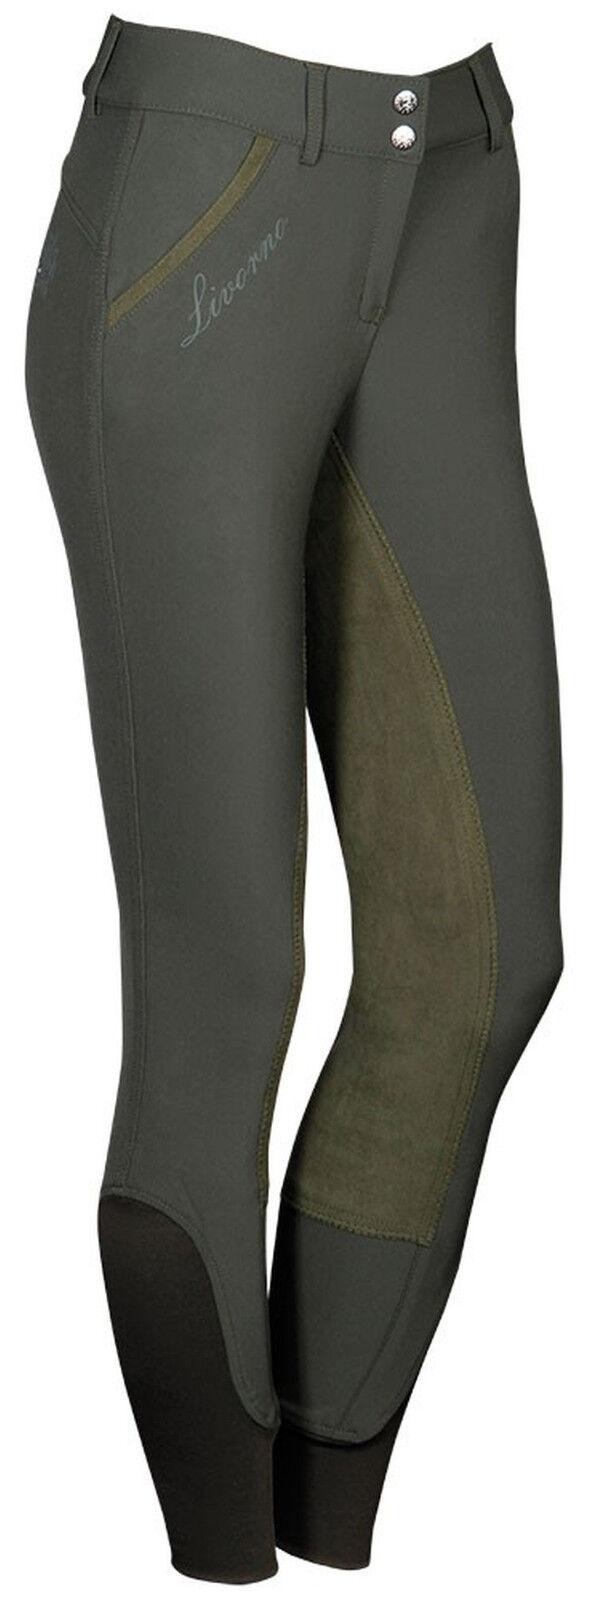 Harry's Horse señora reithose livorno plus ribete de pleno bordados + pedrería verde